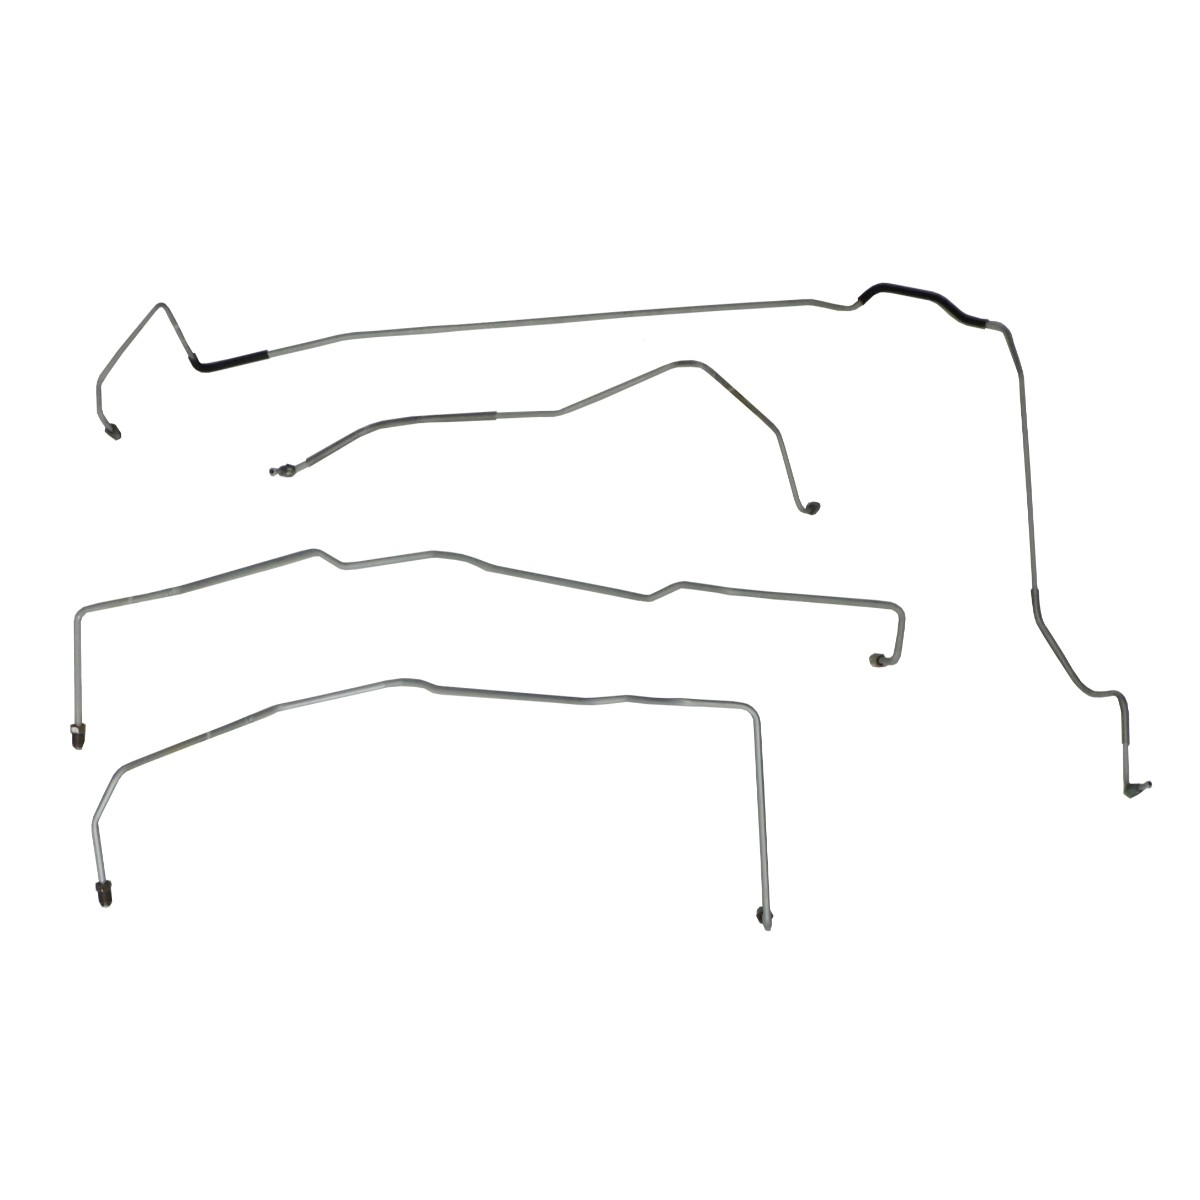 2002 Buick Lesabre Brake Lines